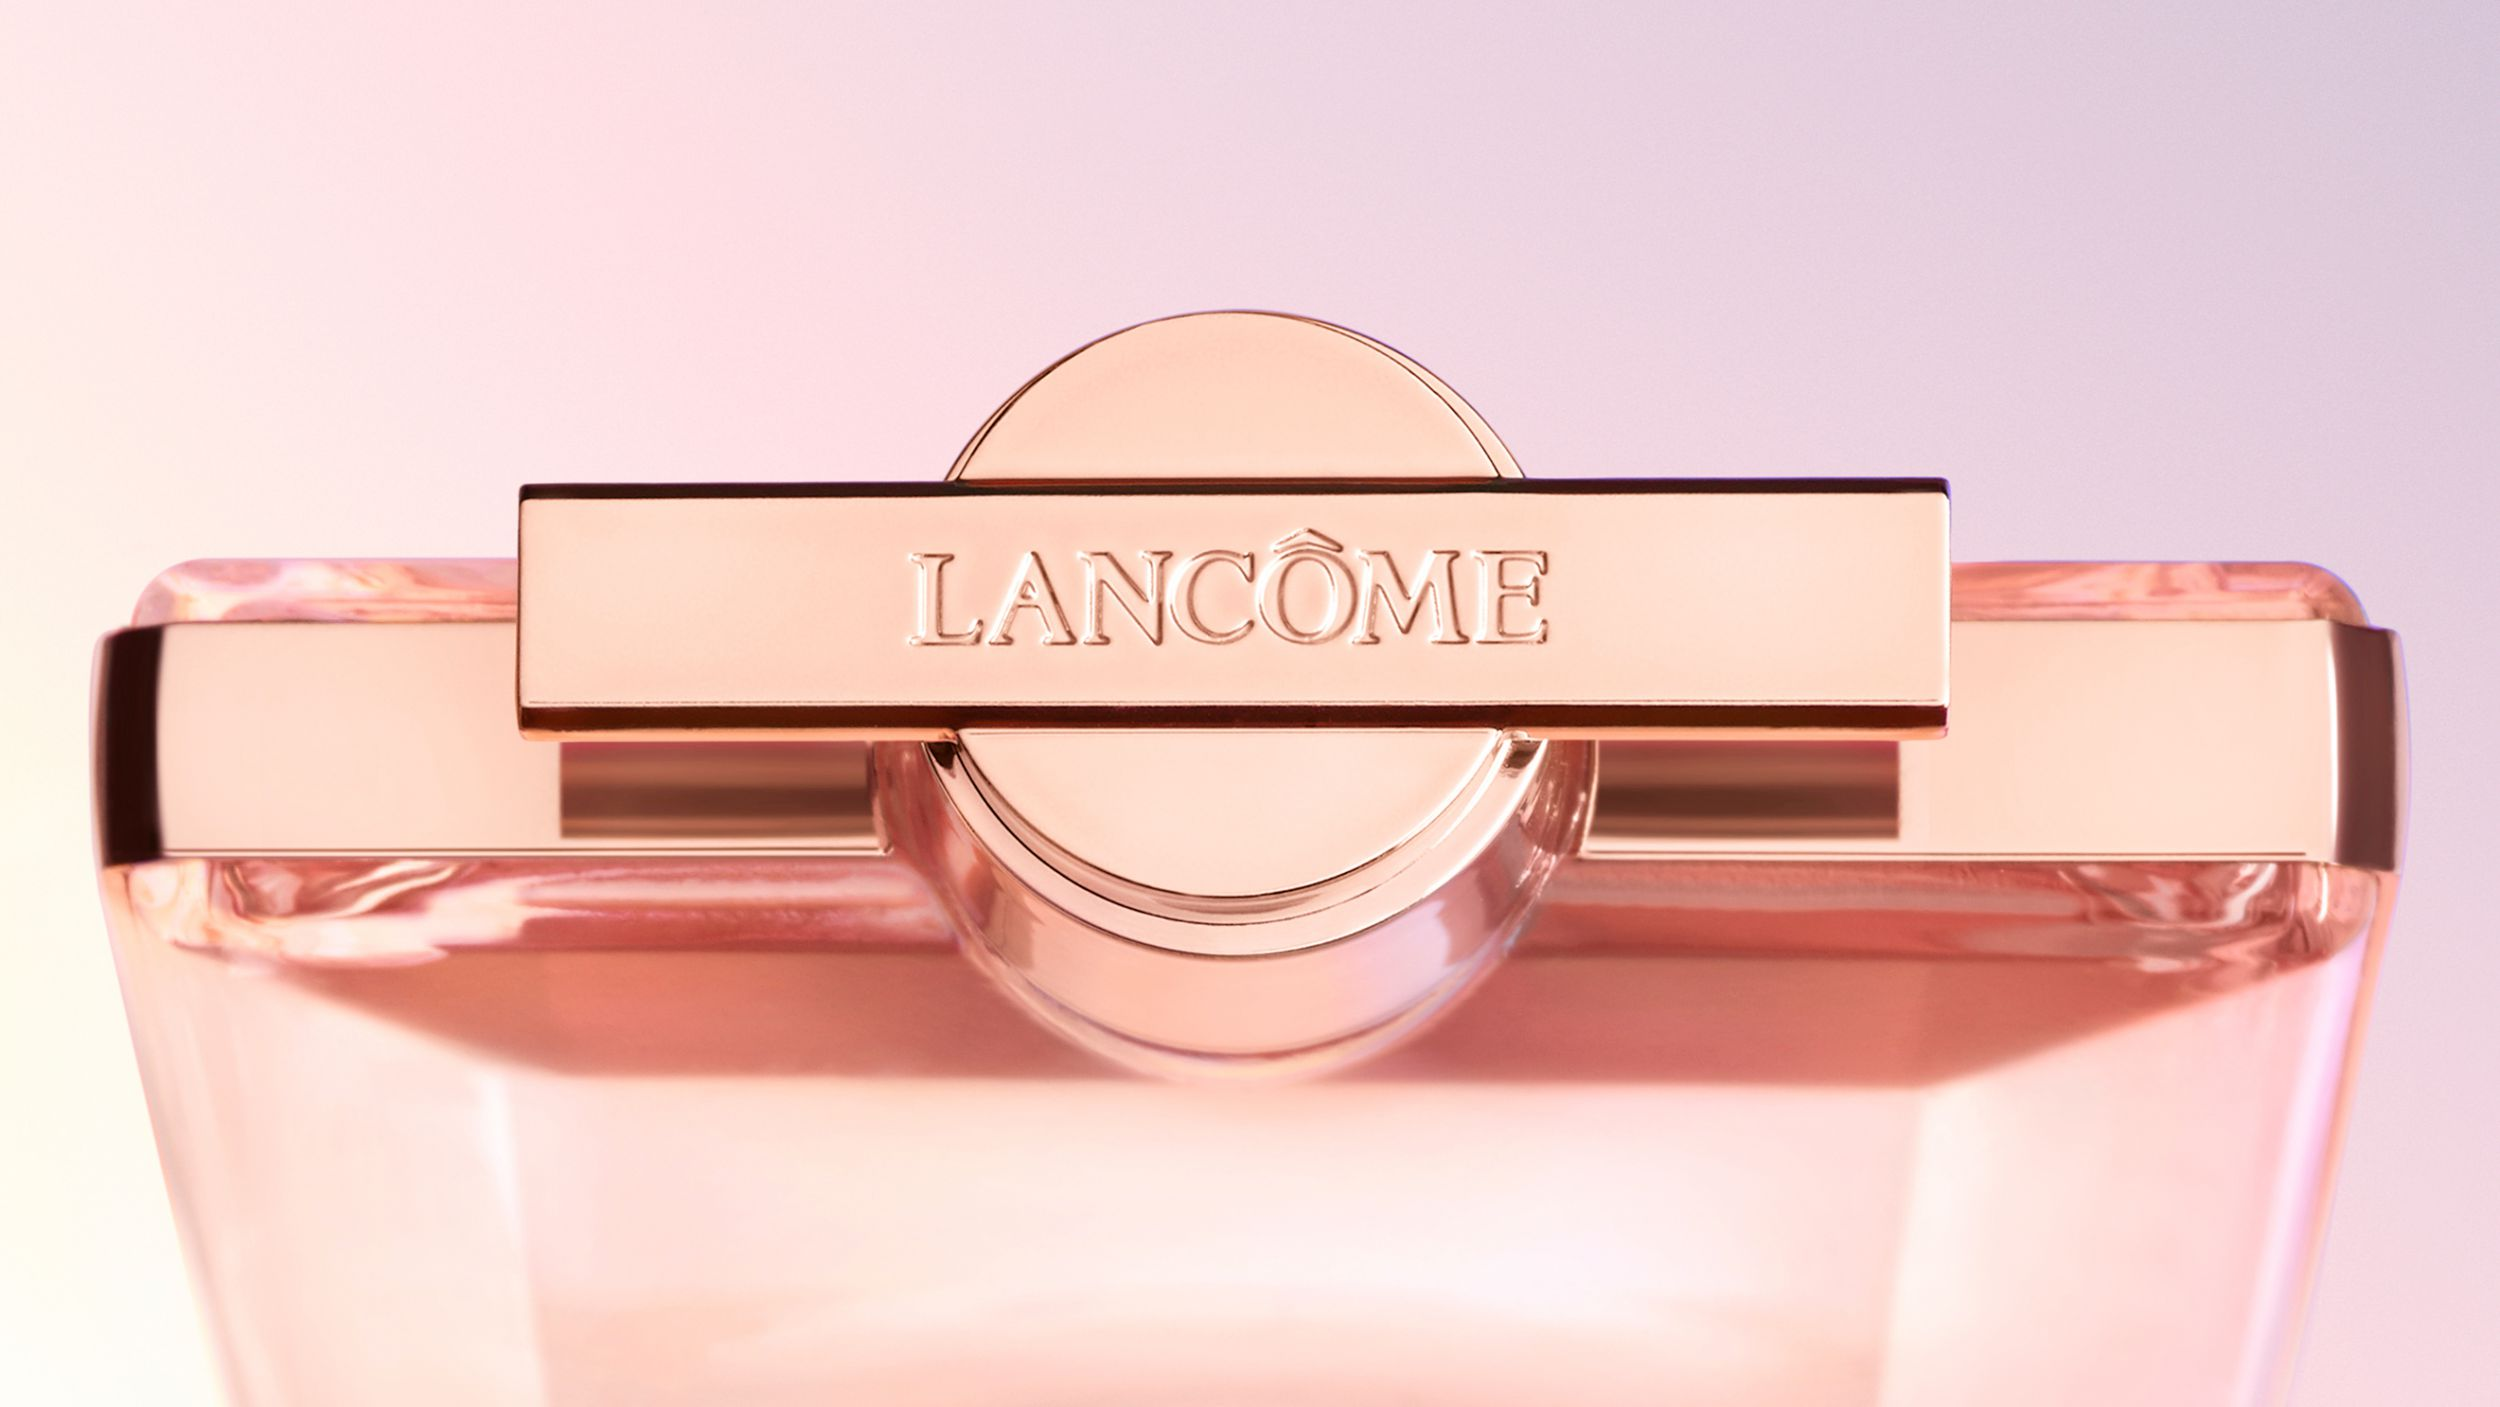 Lancome Idole Compra Online